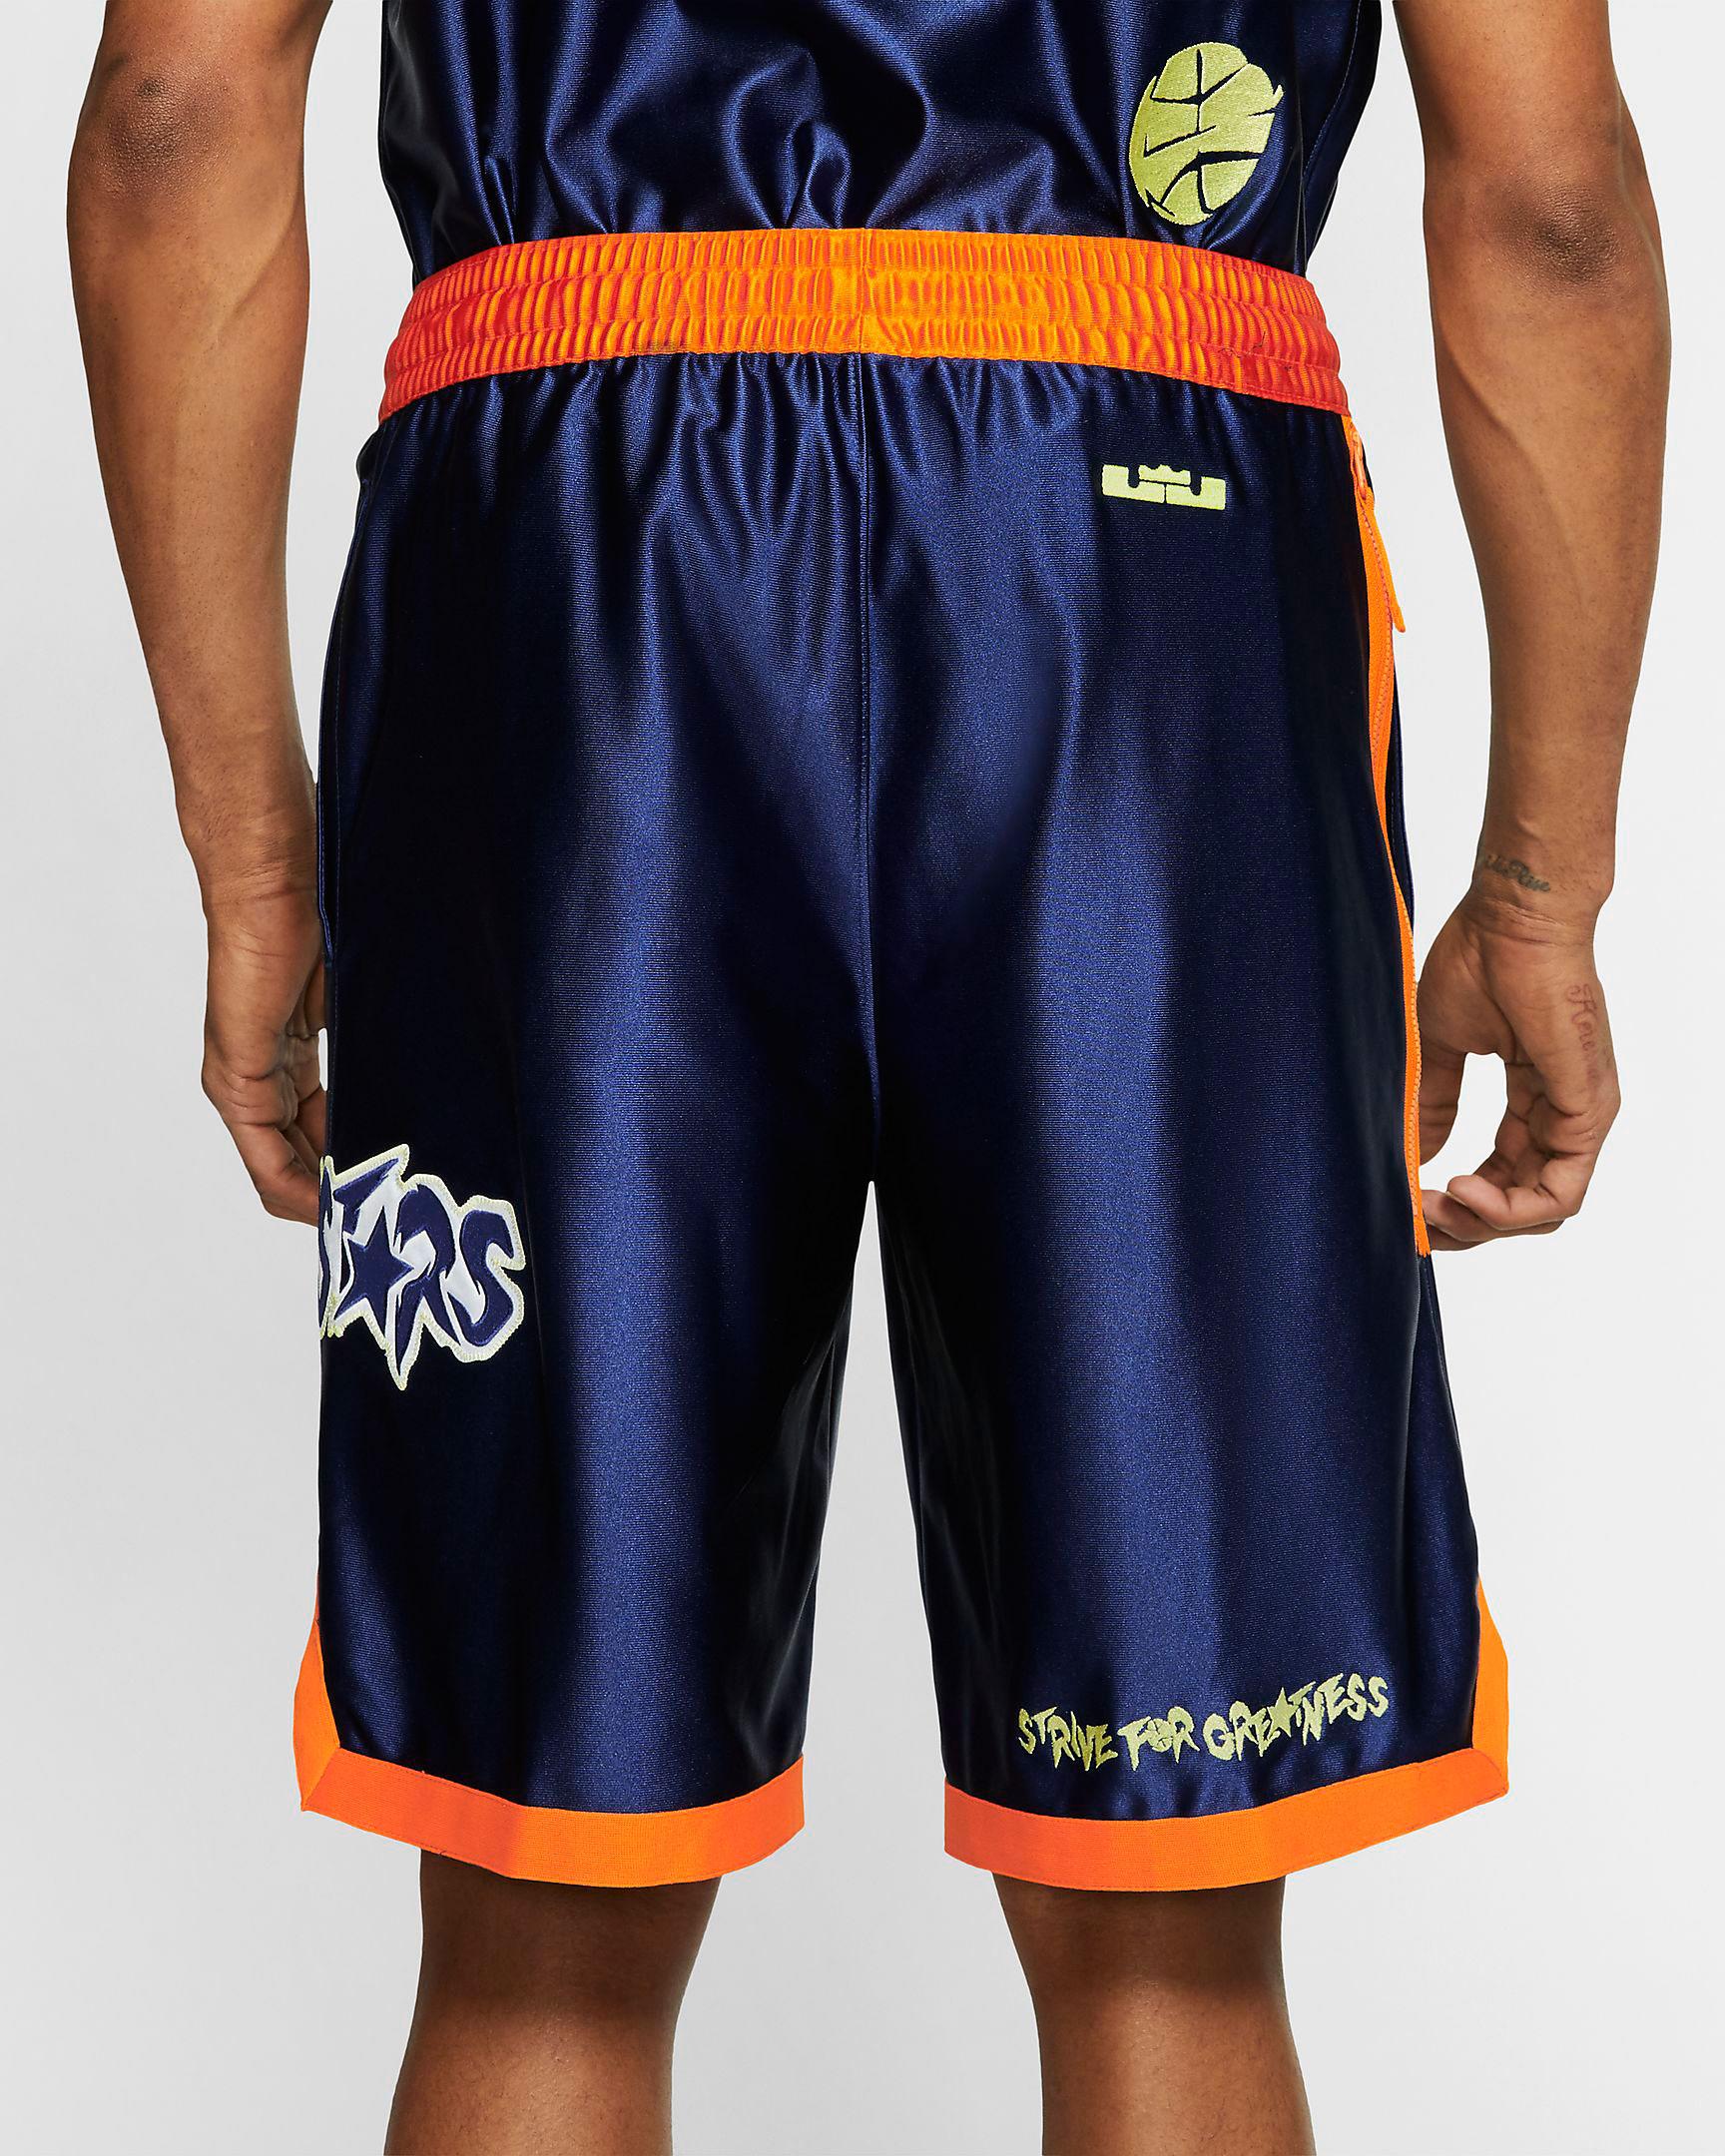 nike-lebron-monstars-shorts-2